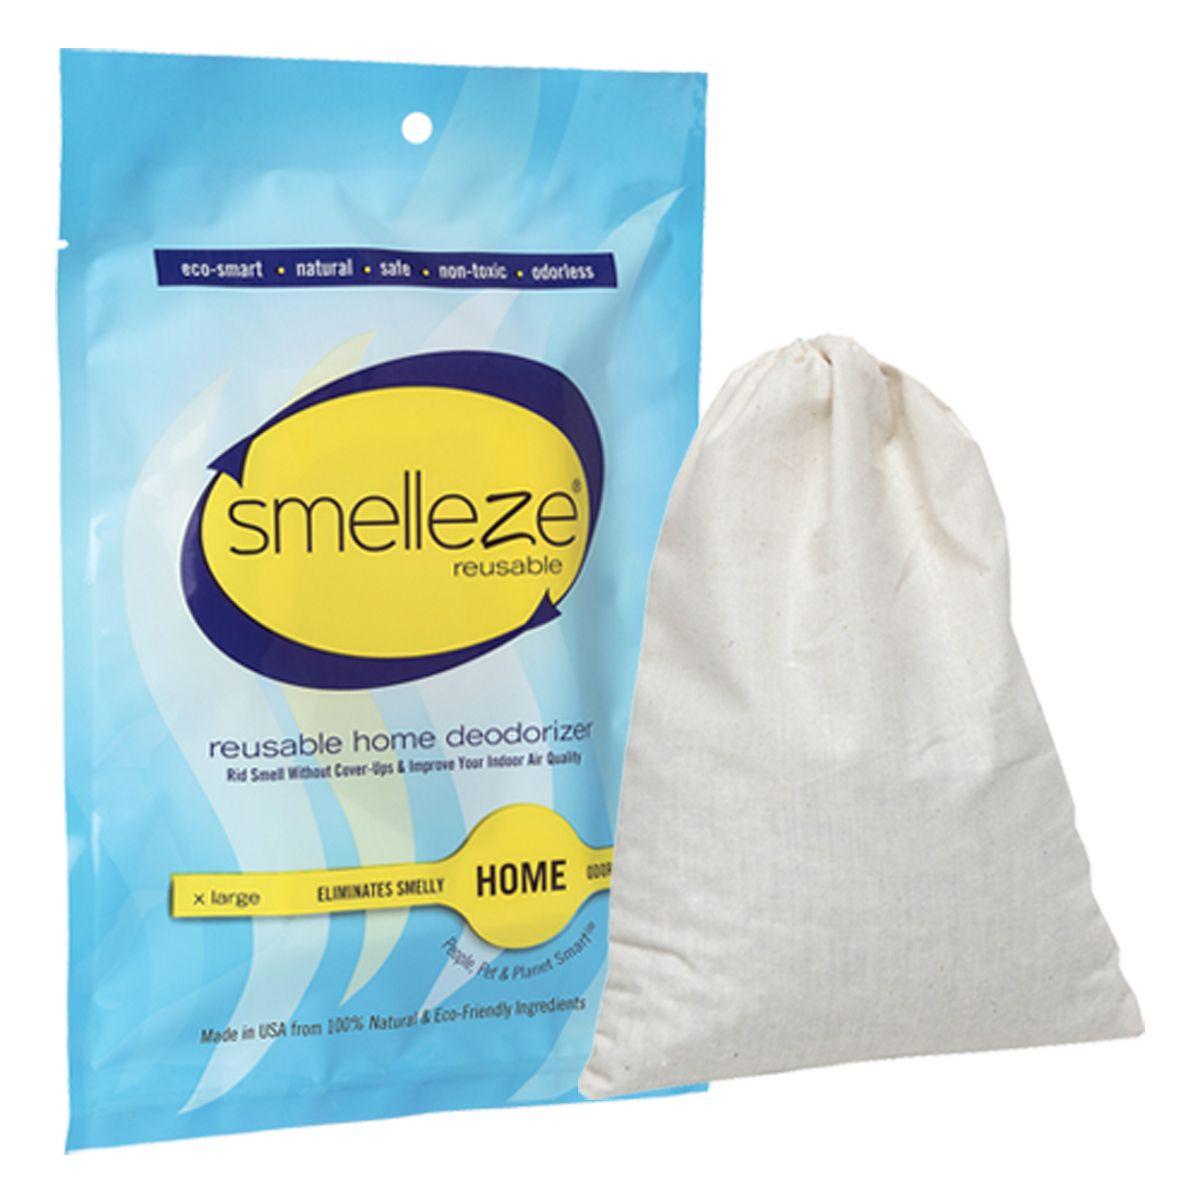 Smelleze odor removal pouch